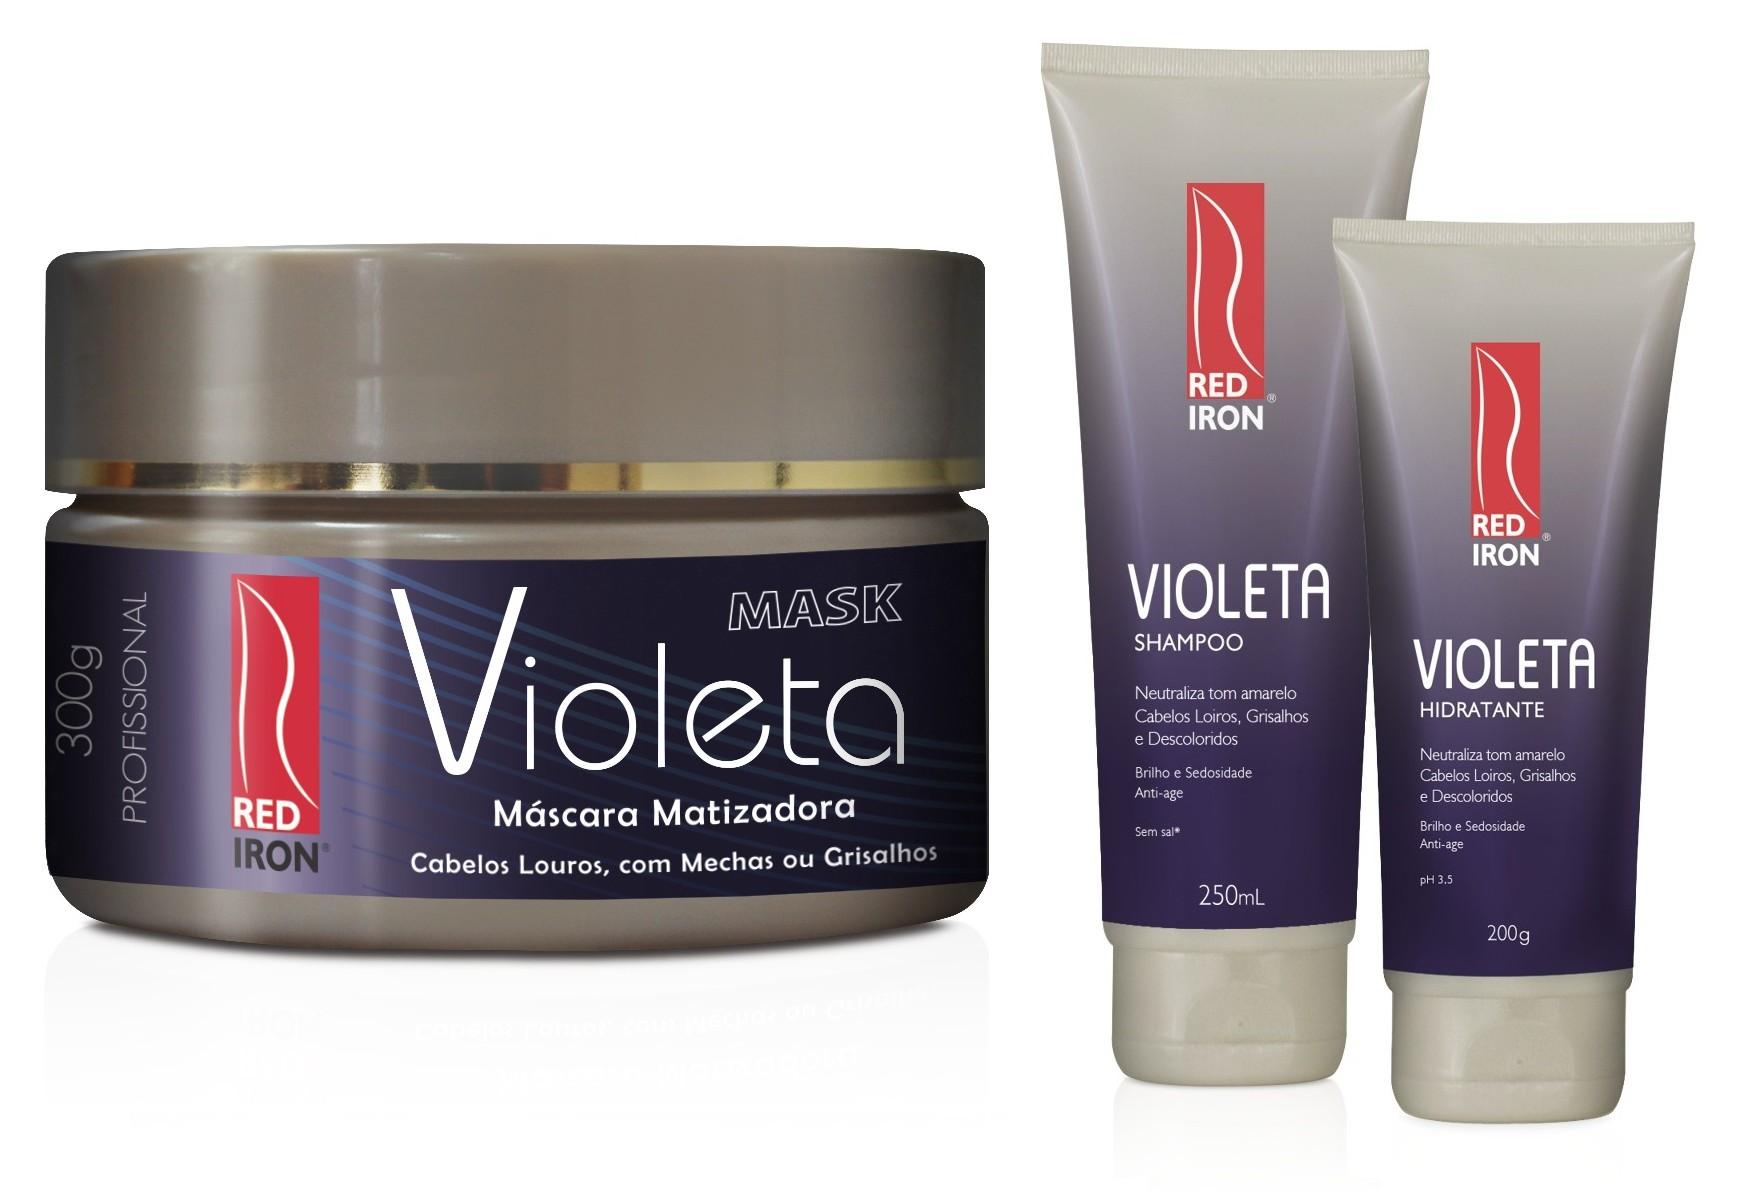 Red Iron Matizador Violeta Kit Shampoo 250ml + Hidratante Violeta 200g + Máscara 300g